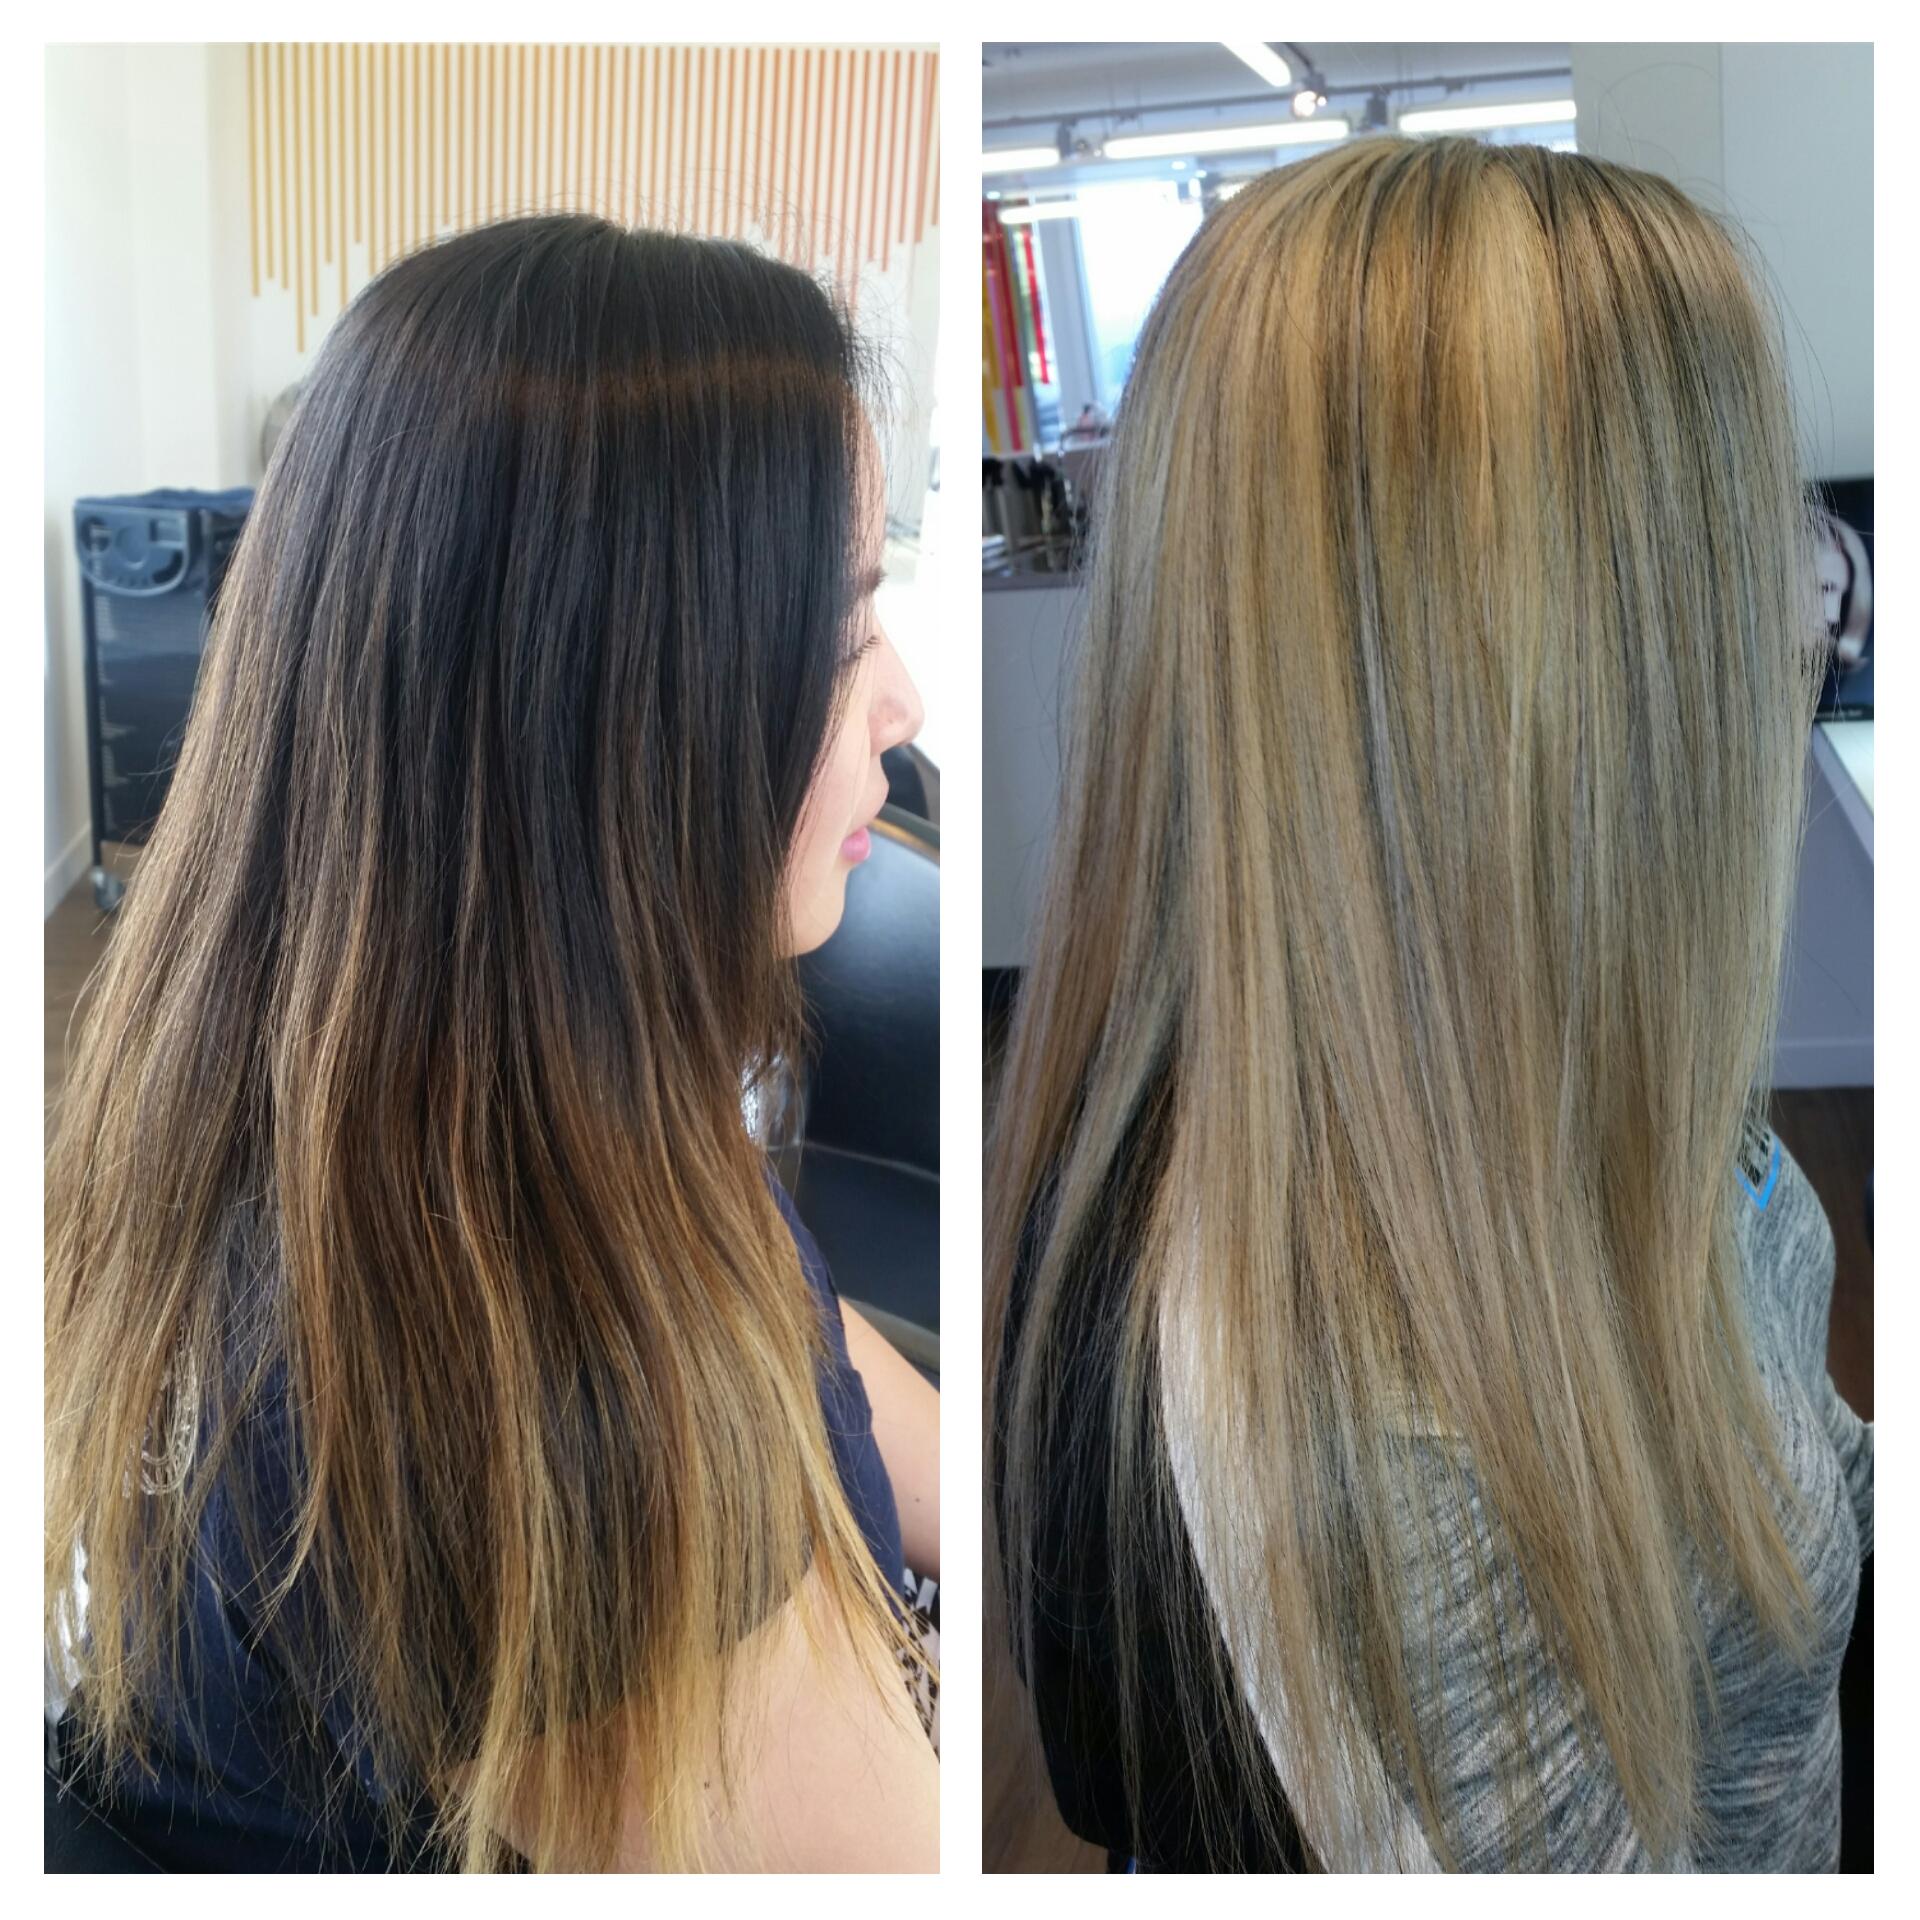 Another gorgeous transformation using #Olaplex. Colourist: Roxanne http://hue.co.nz/http:/hue.co.nz/services/blog/